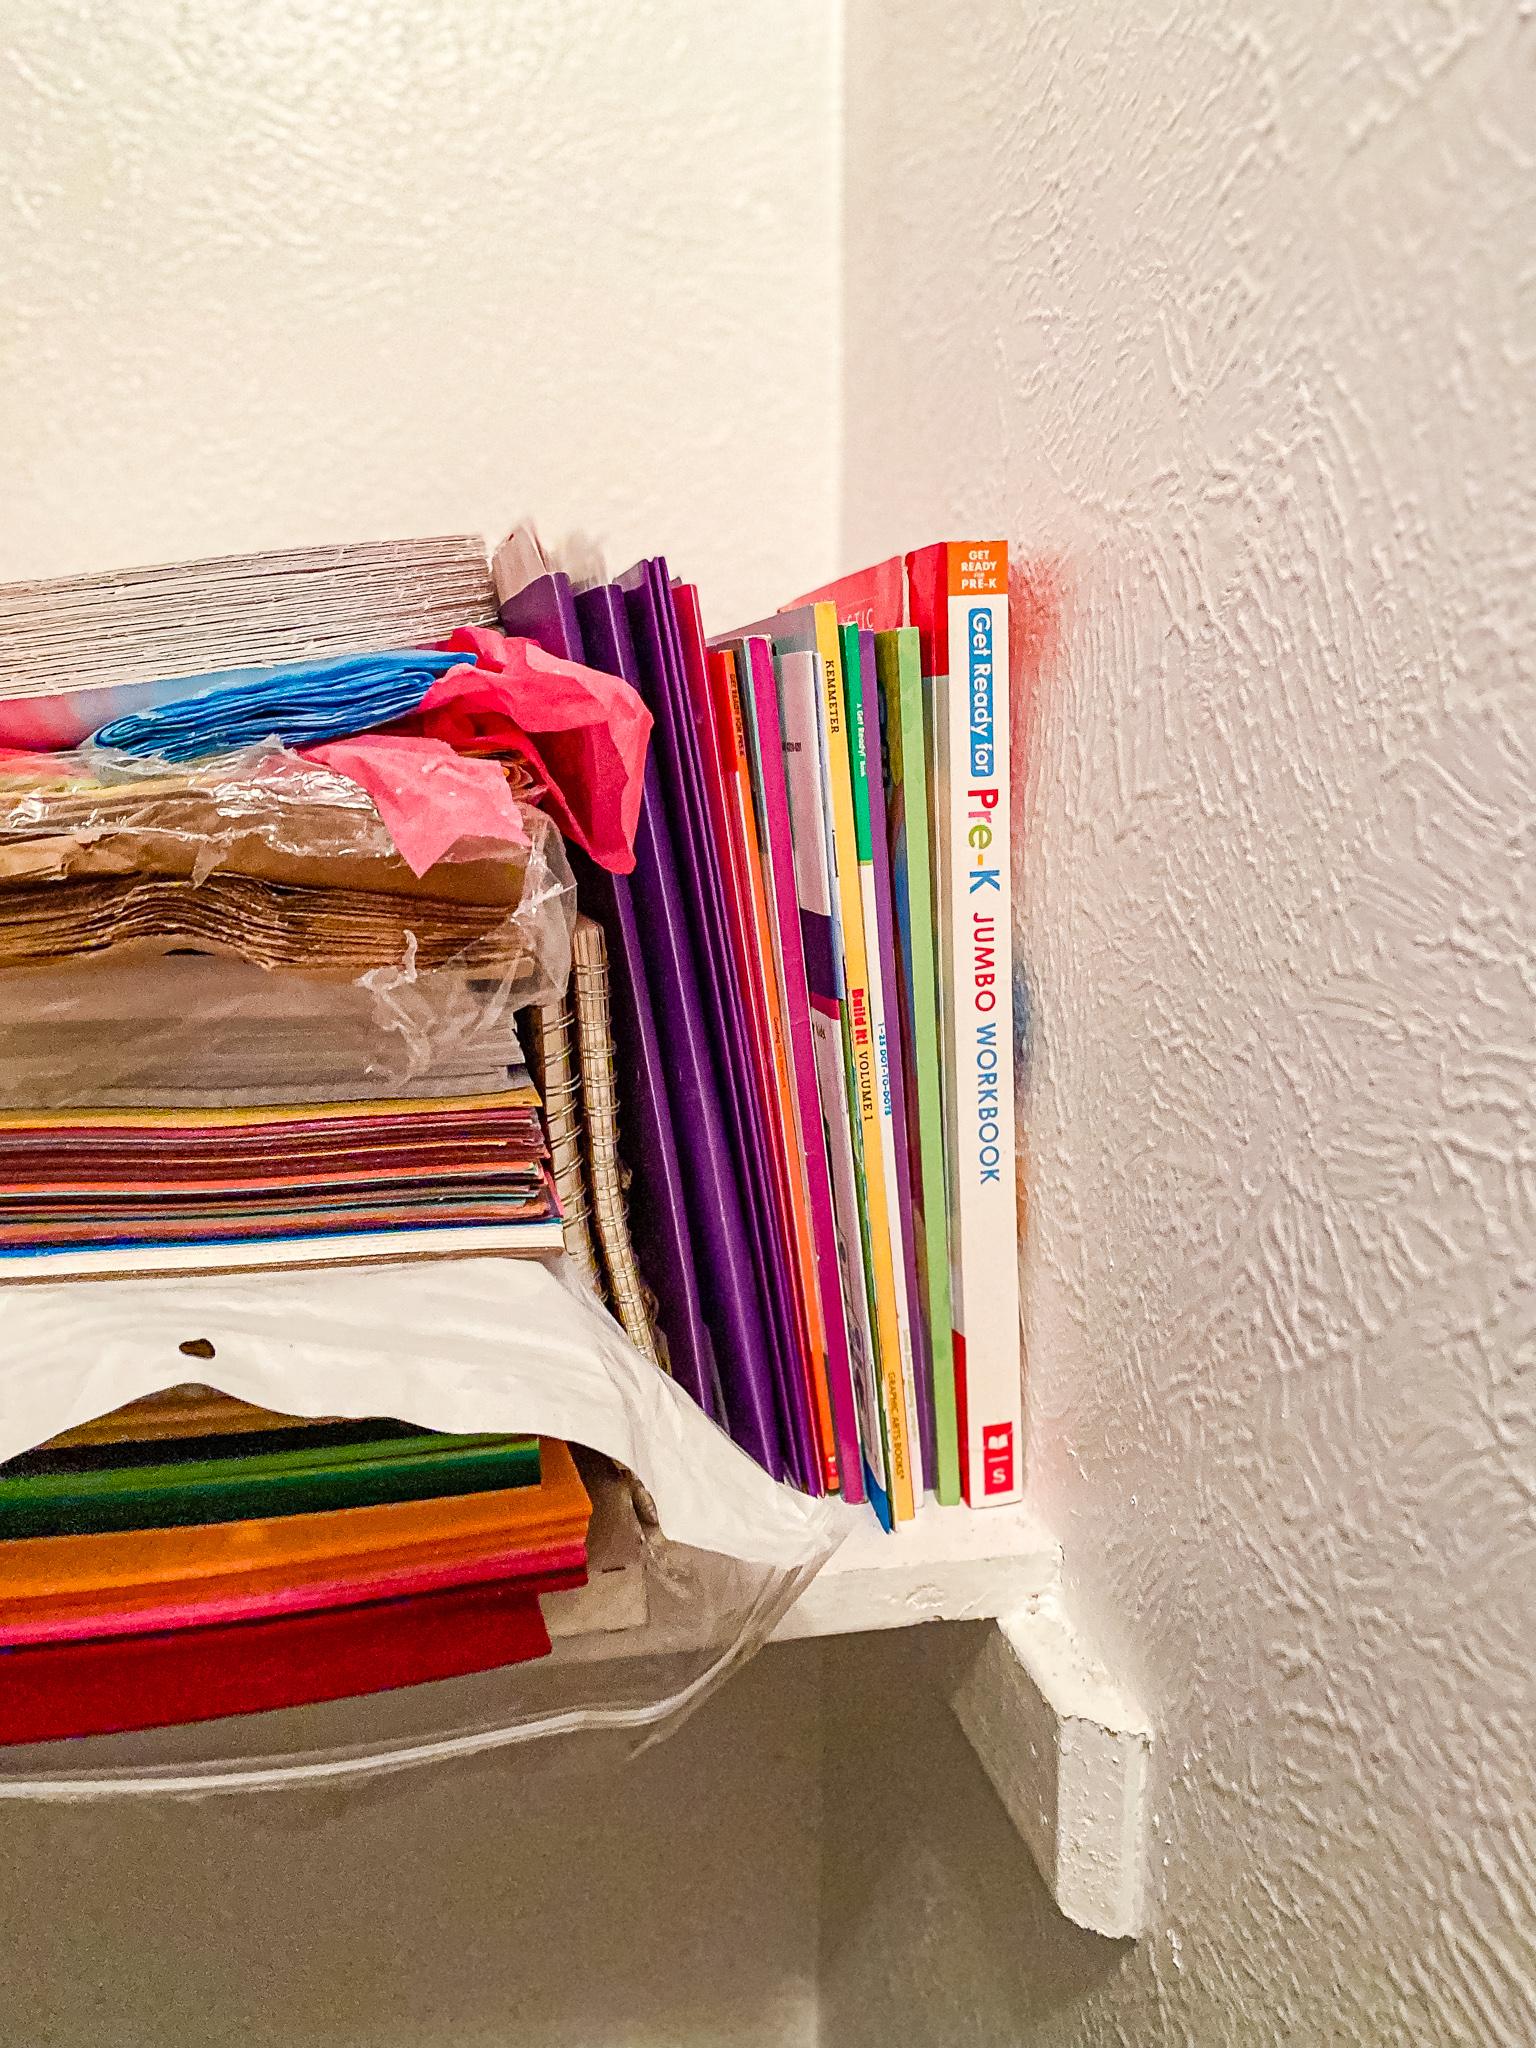 Easy to grab Homeschool Materials